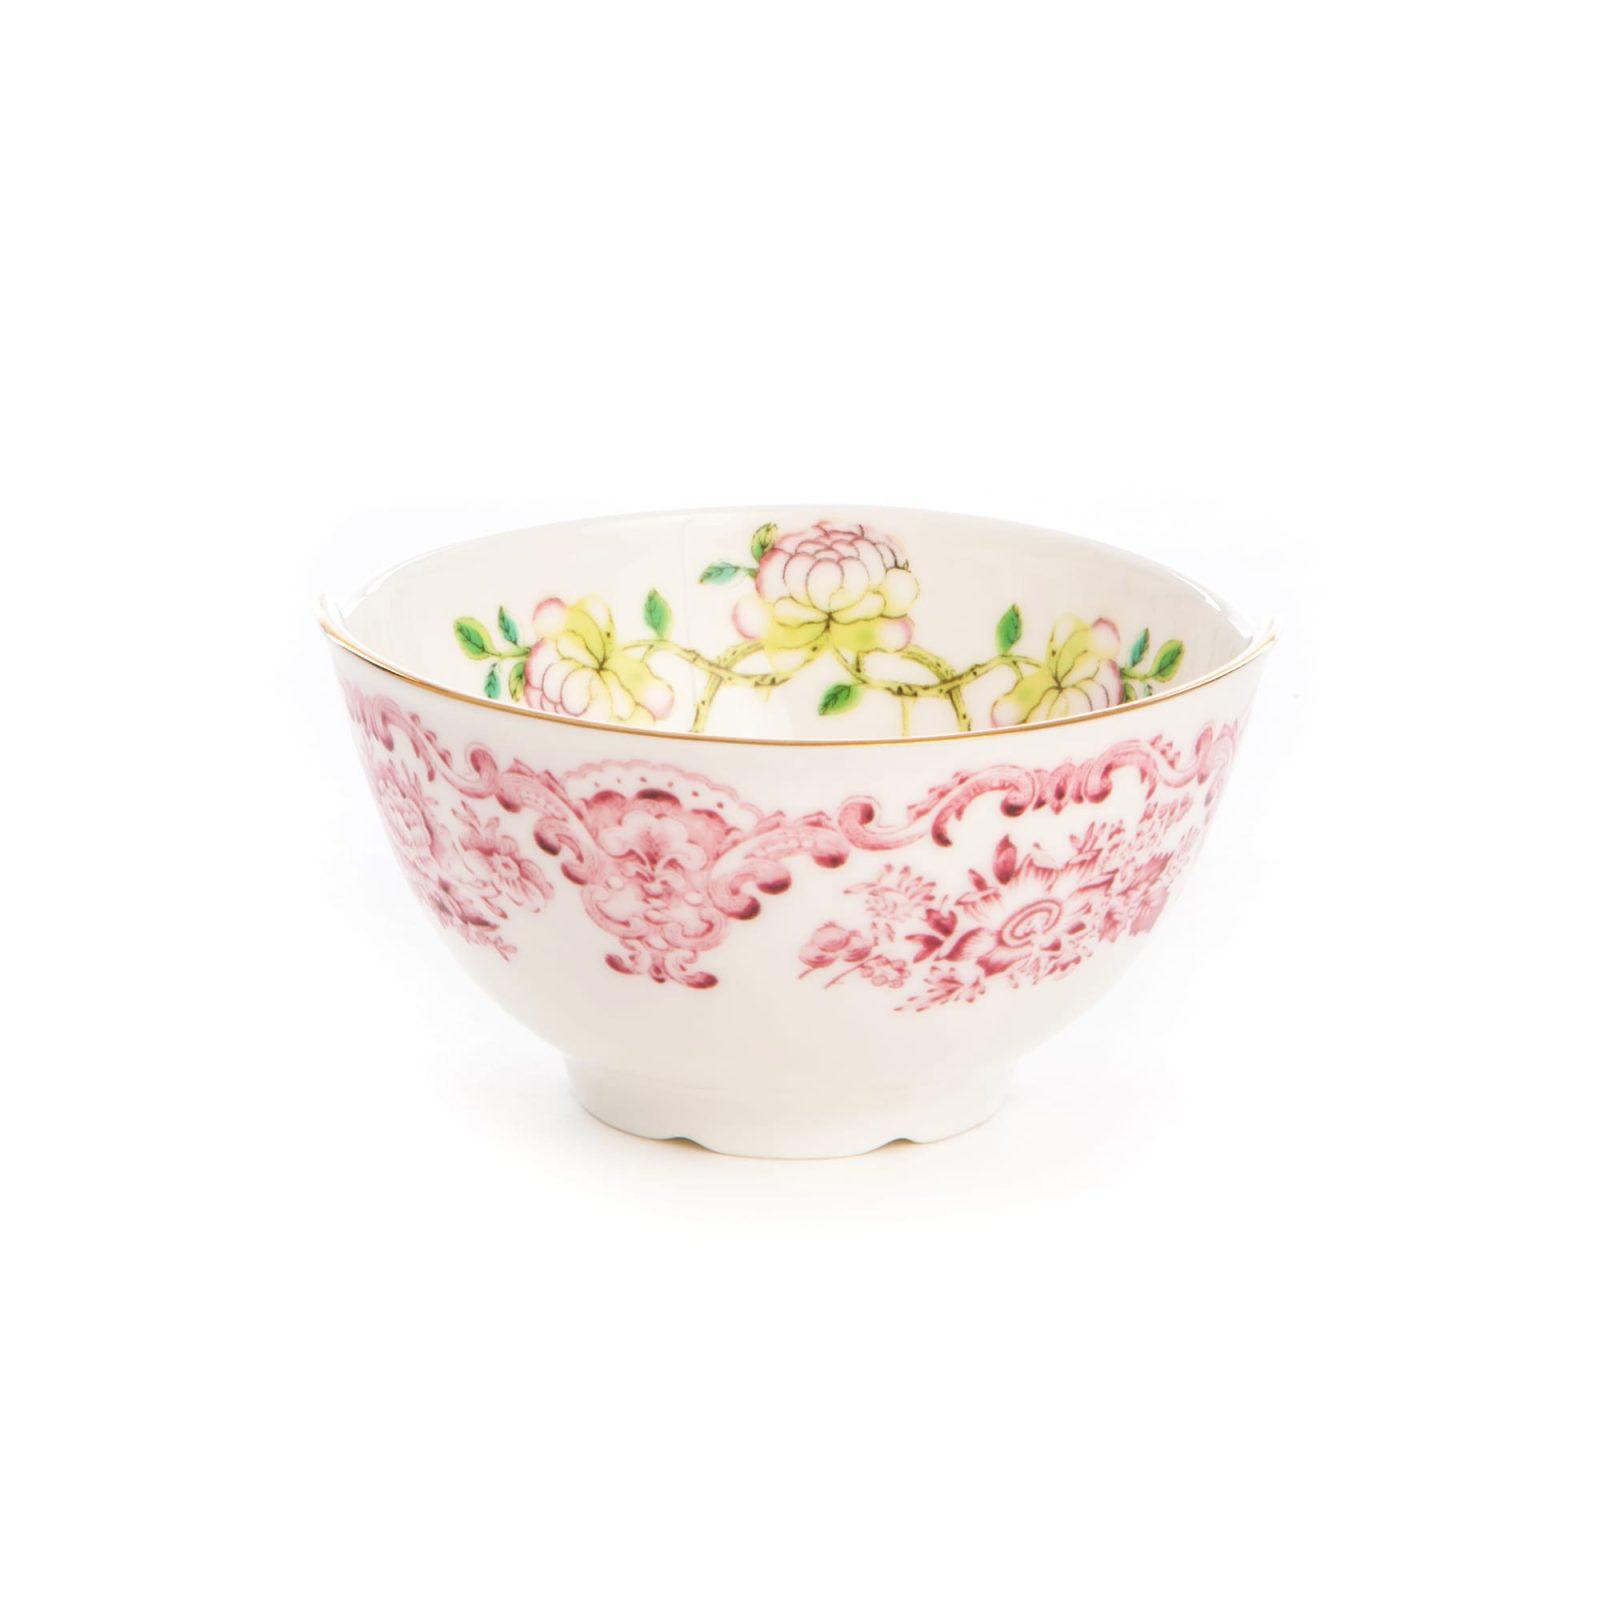 Seletti Hybrid Collection, Olinda Fruit Bowl -32421